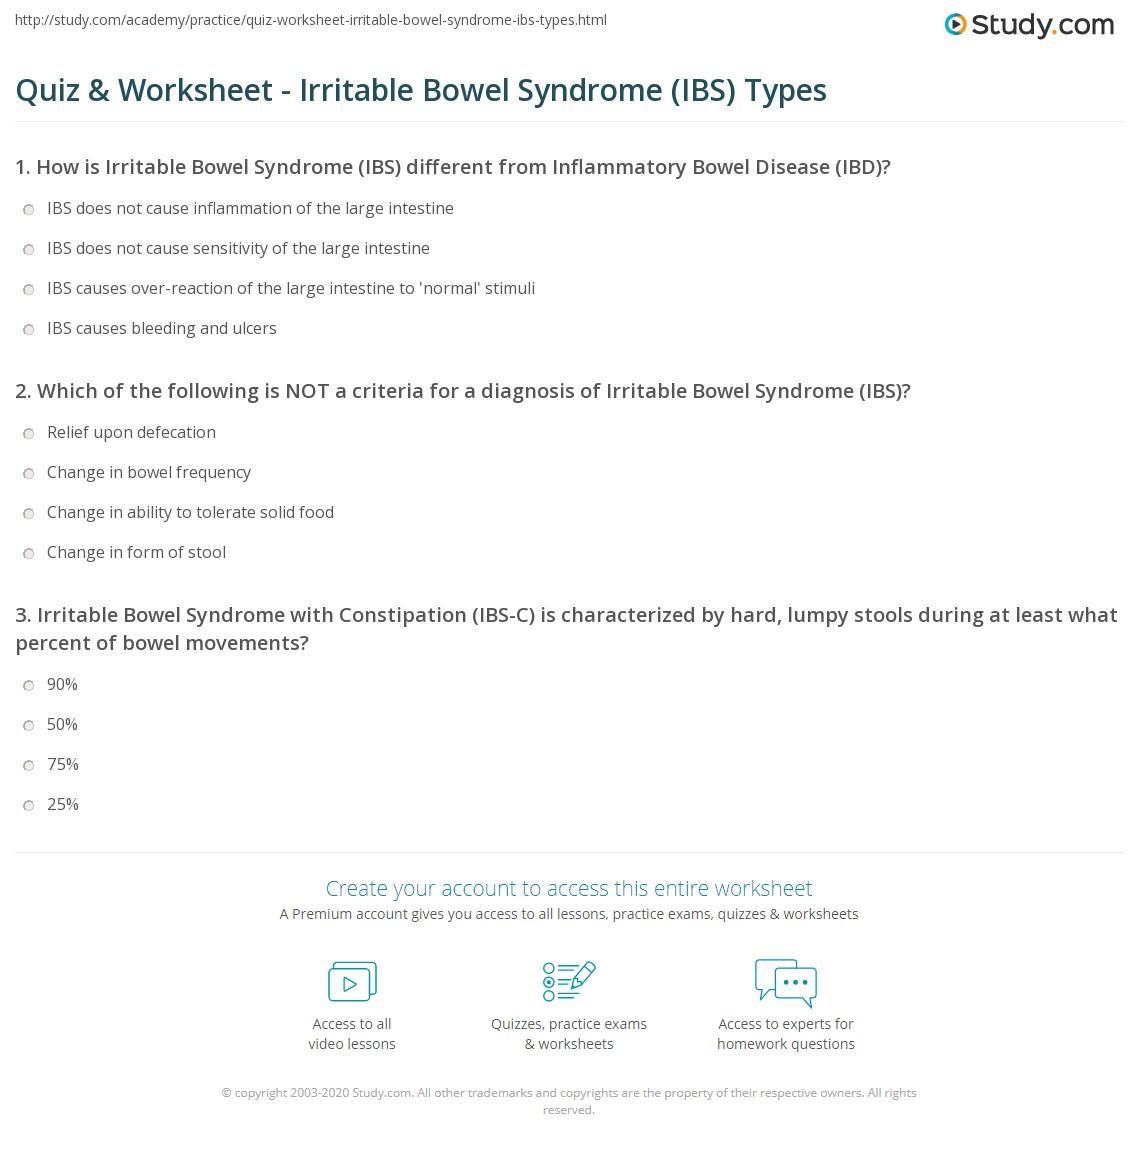 Quiz & Worksheet - Irritable Bowel Syndrome (IBS) Types